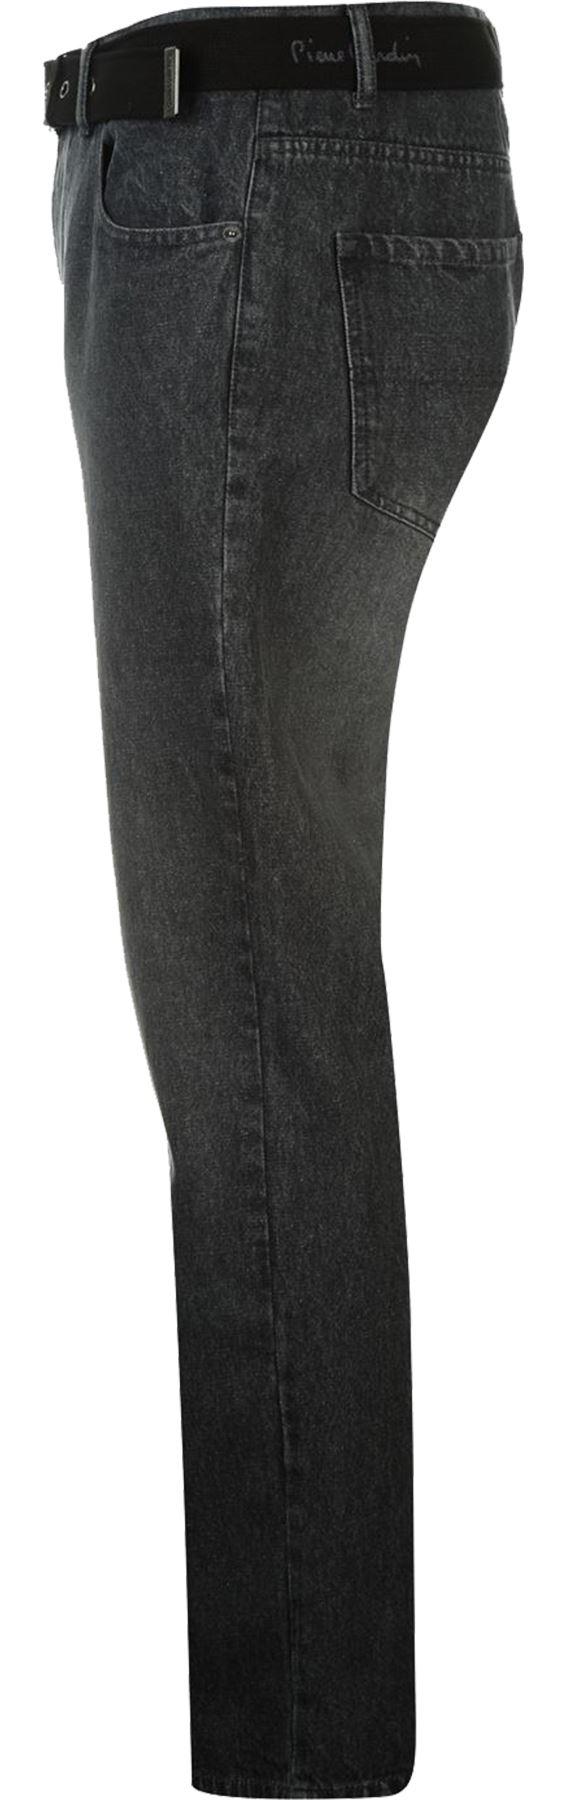 Mens-Belted-Denim-Jeans-Straight-Leg-Regular-Fit-Pierre-Cardin-Pants-Big-Tall thumbnail 7